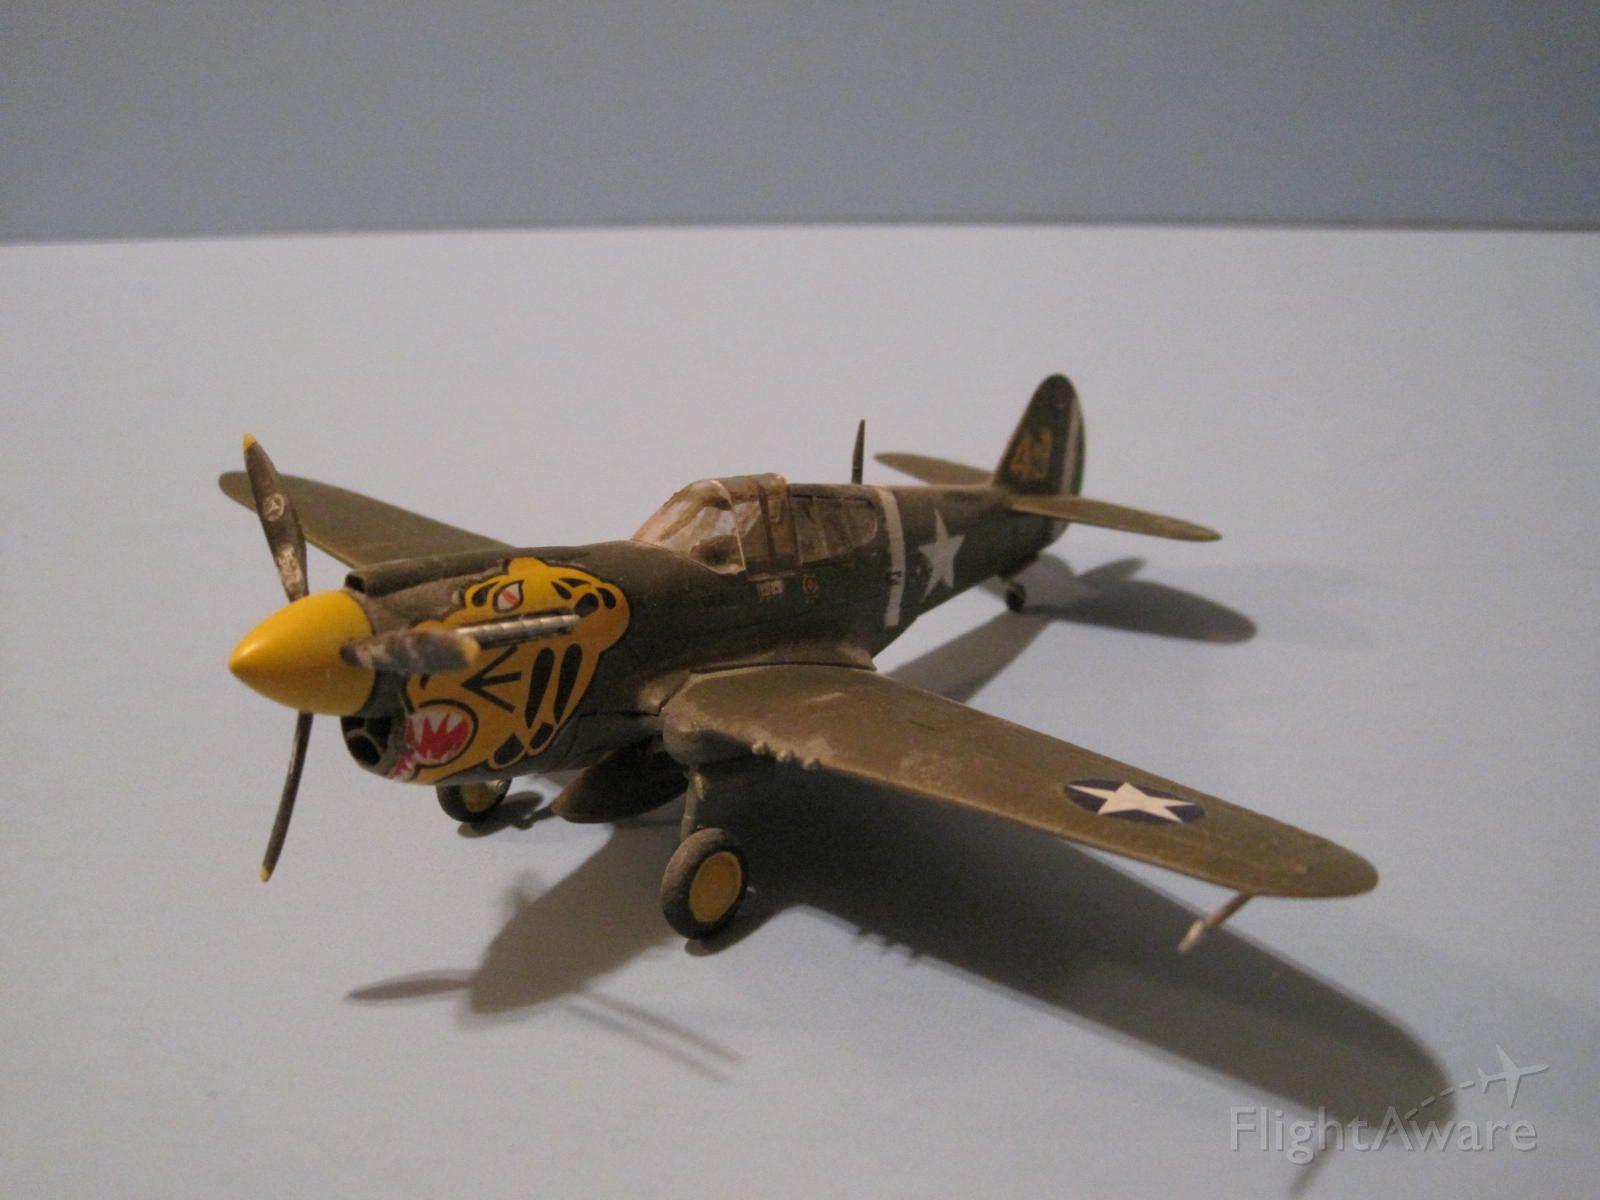 P40 — - 1/72 scale, Curtis P-40E Warhawk, Academy kit.